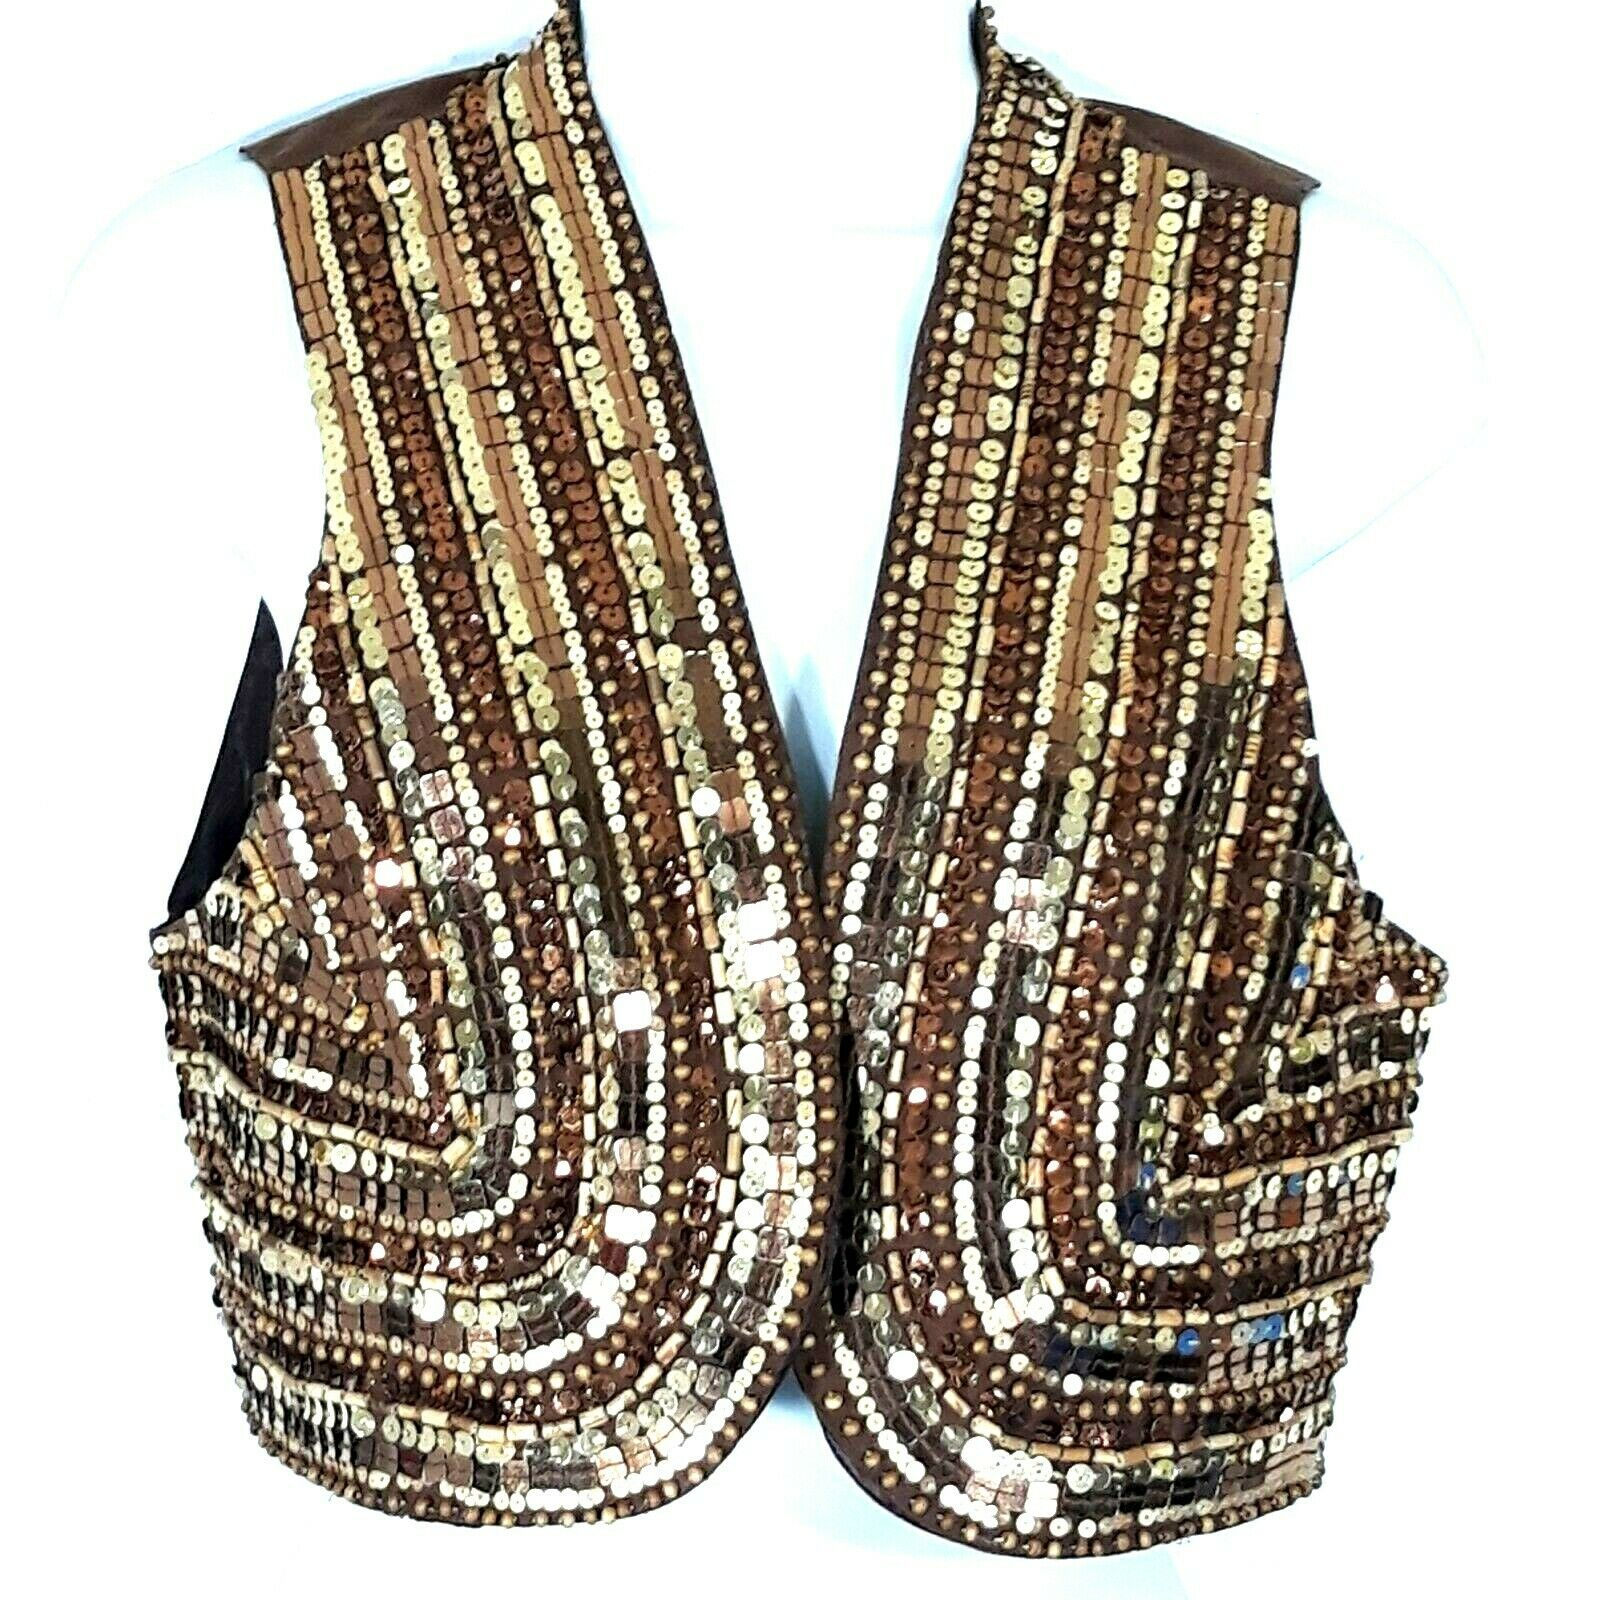 Boston Proper Women Small Open Vest Evening Party Top Brown Top w/ Gold Sequin